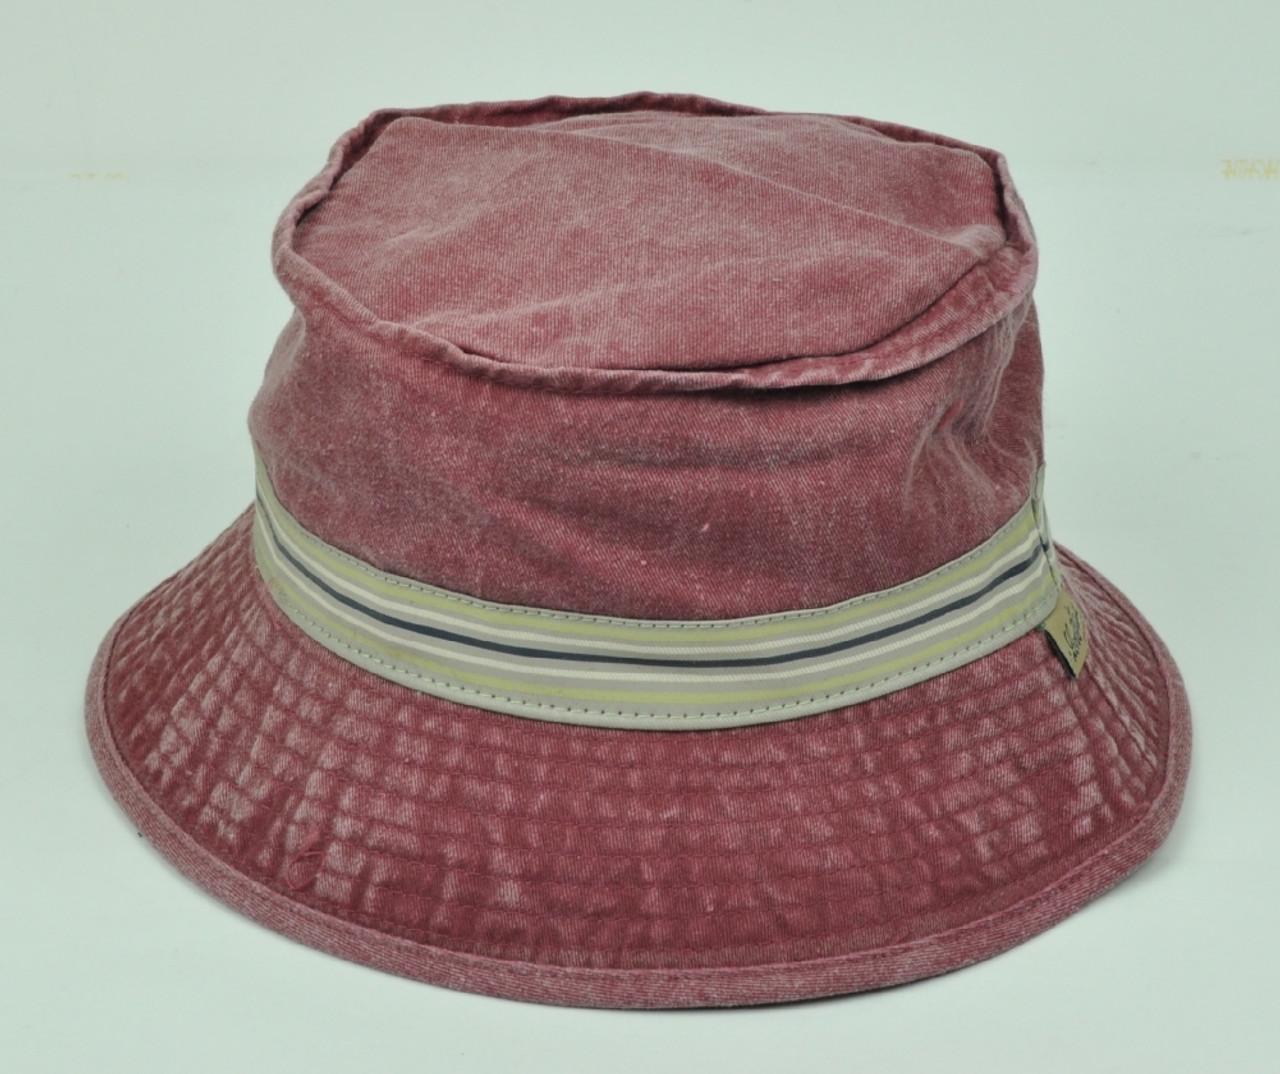 89498c98b Levis Strauss Signature Vintage Distressed Sun Bucket Hat Large XLarge  Burgundy